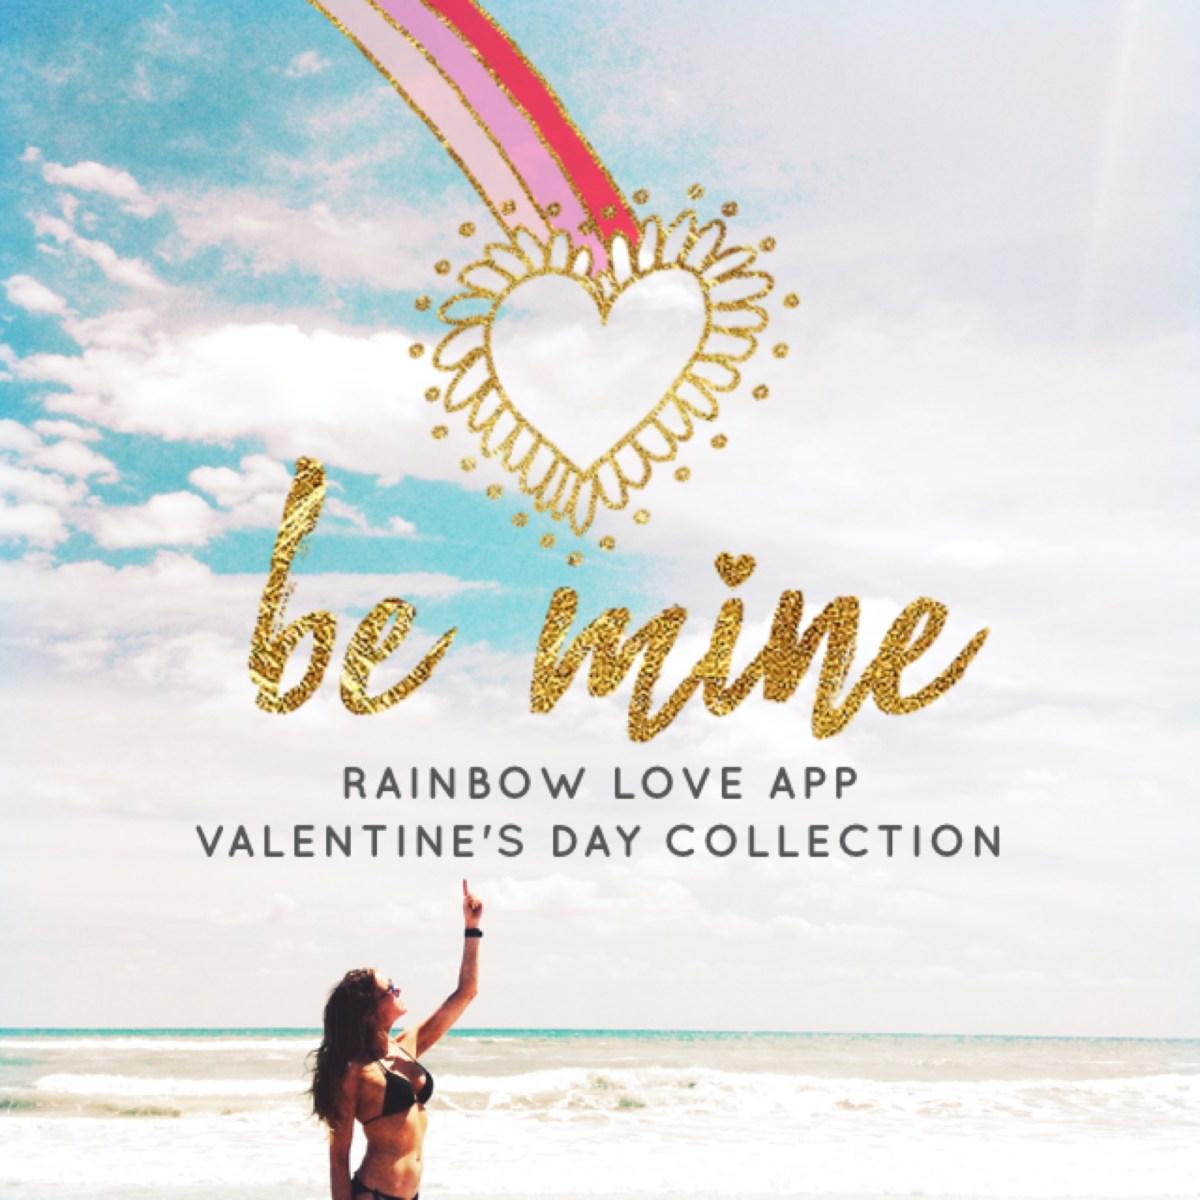 rainbow-love-app-valentines-day-photo-art-and-filters-make-a-rainbow-love-valentine-day-card-5